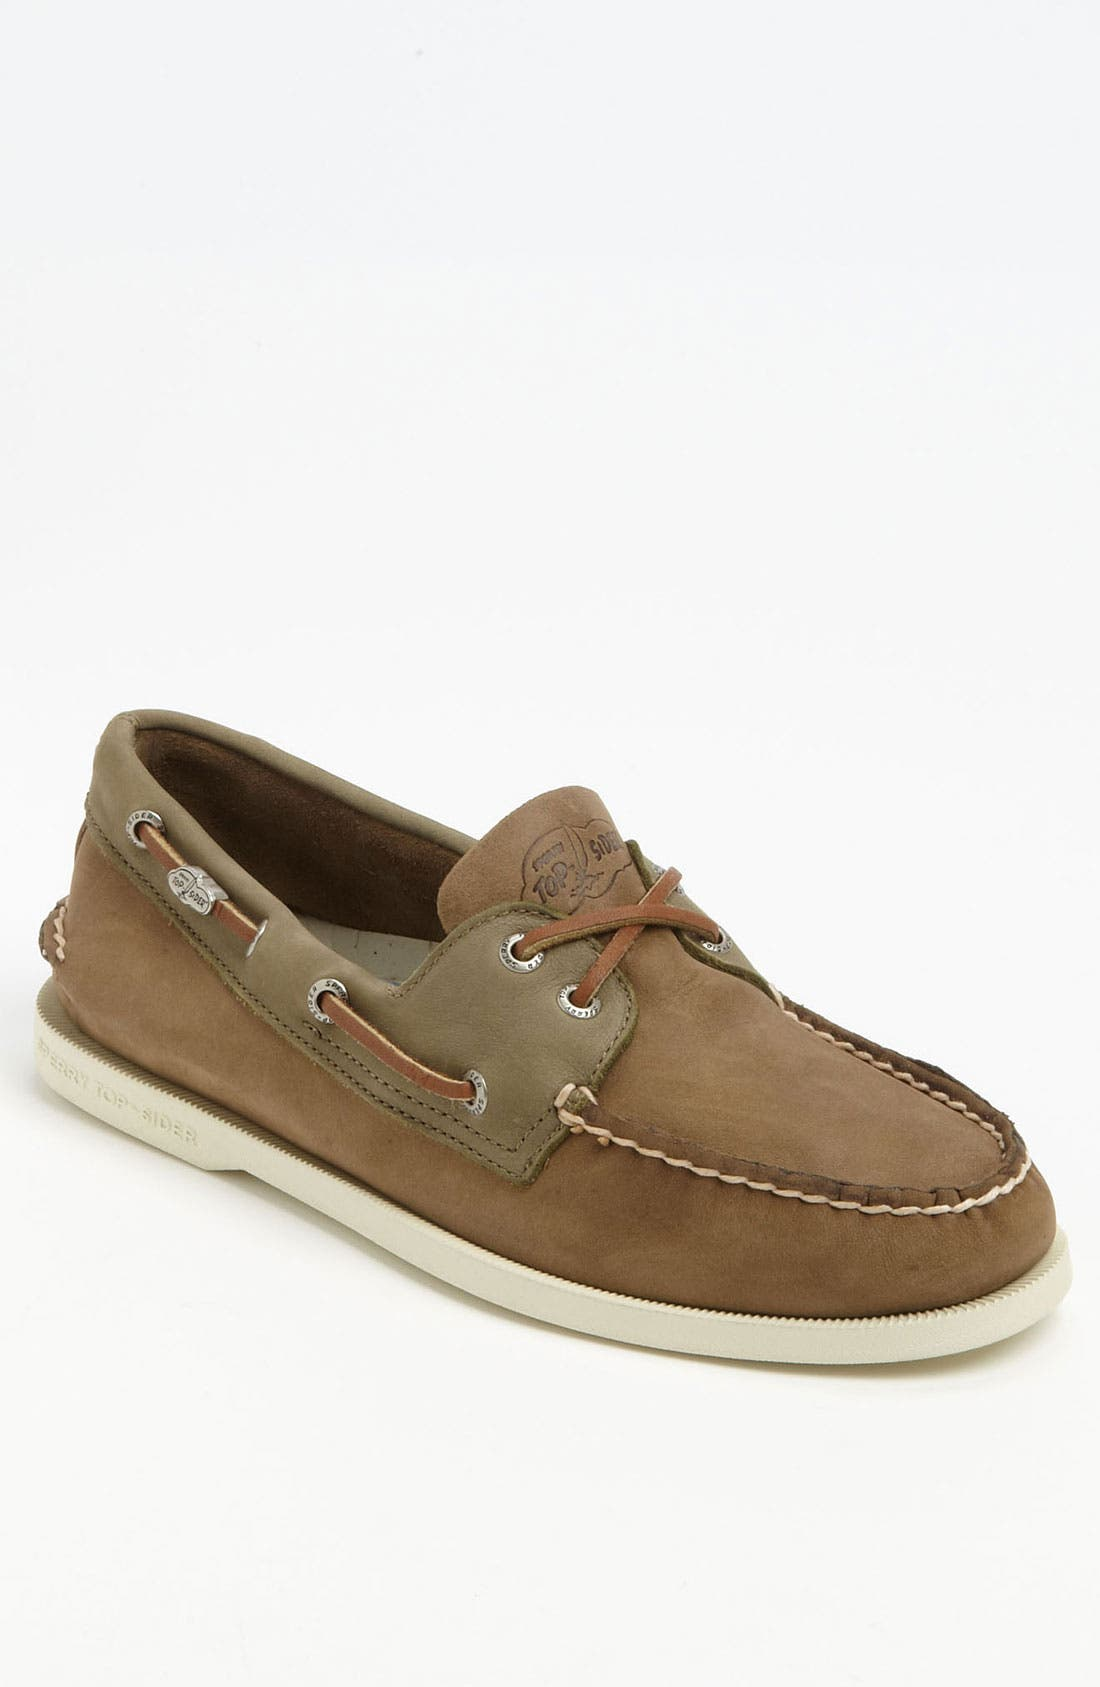 Main Image - Sperry Top-Sider® 'Authentic Original' Boat Shoe (Men) (Online Exclusive)